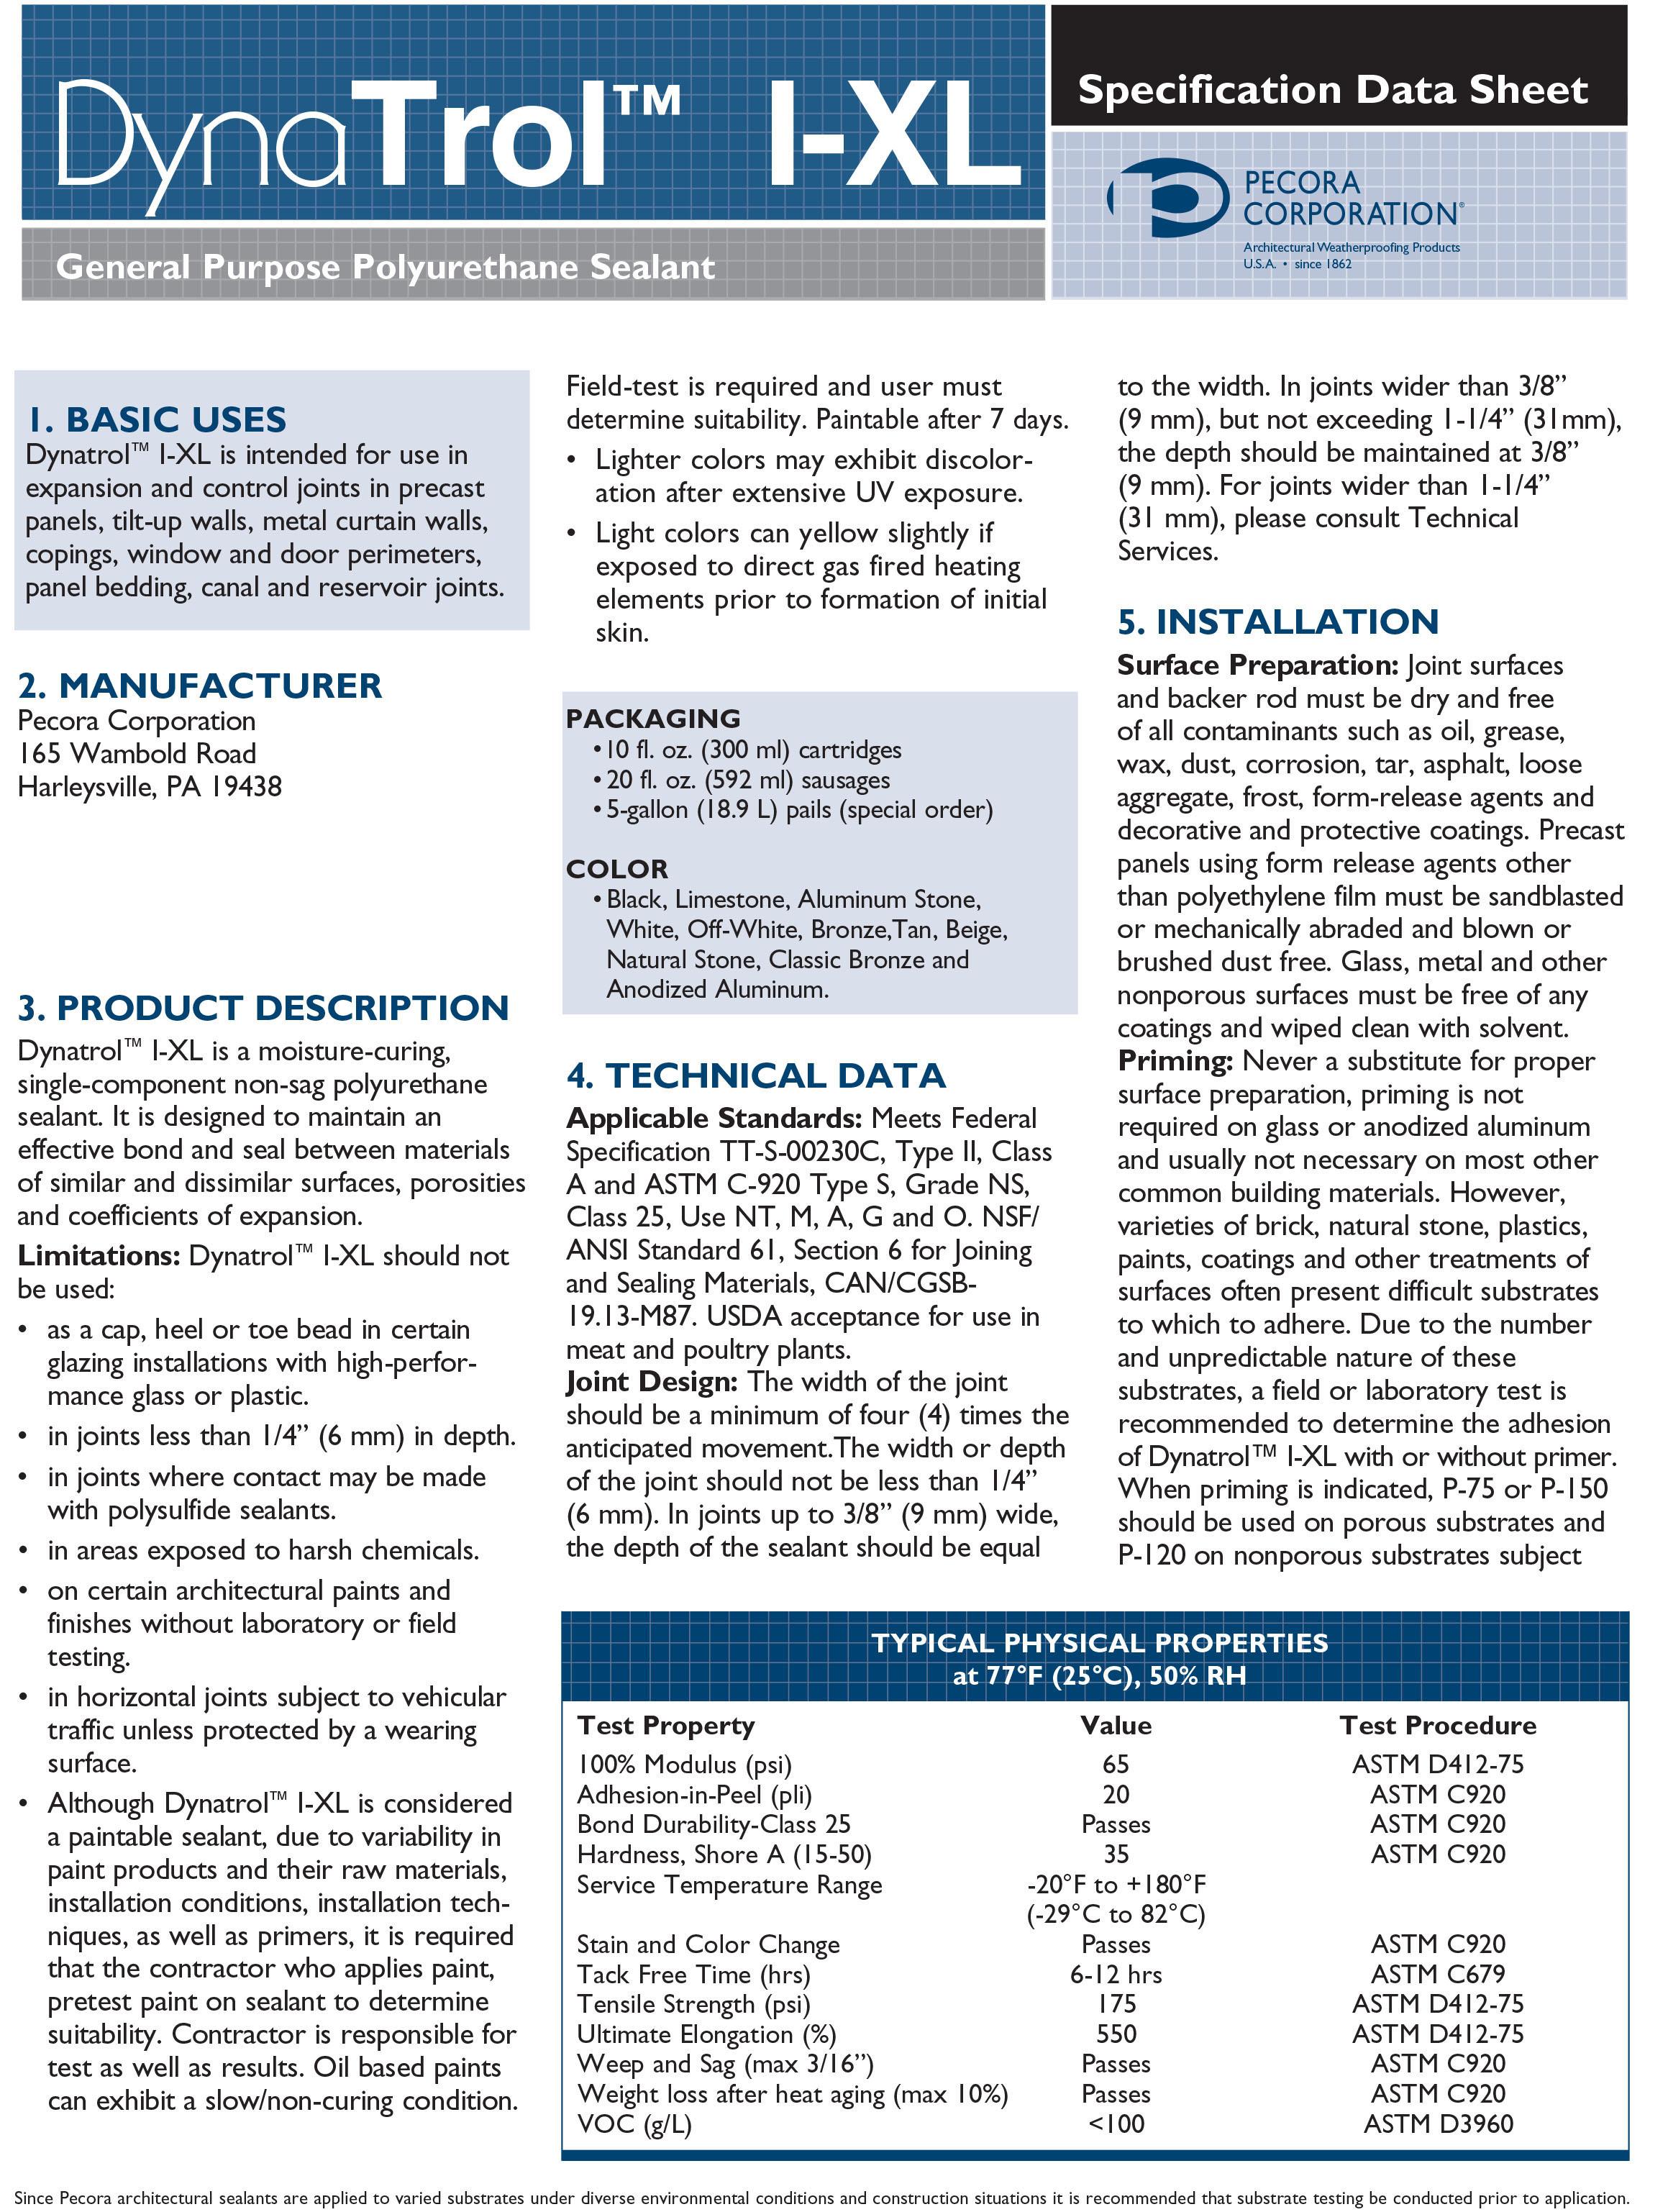 Pecora Dynatrol I-XL: Poly-Urethane Caulk and Sealant